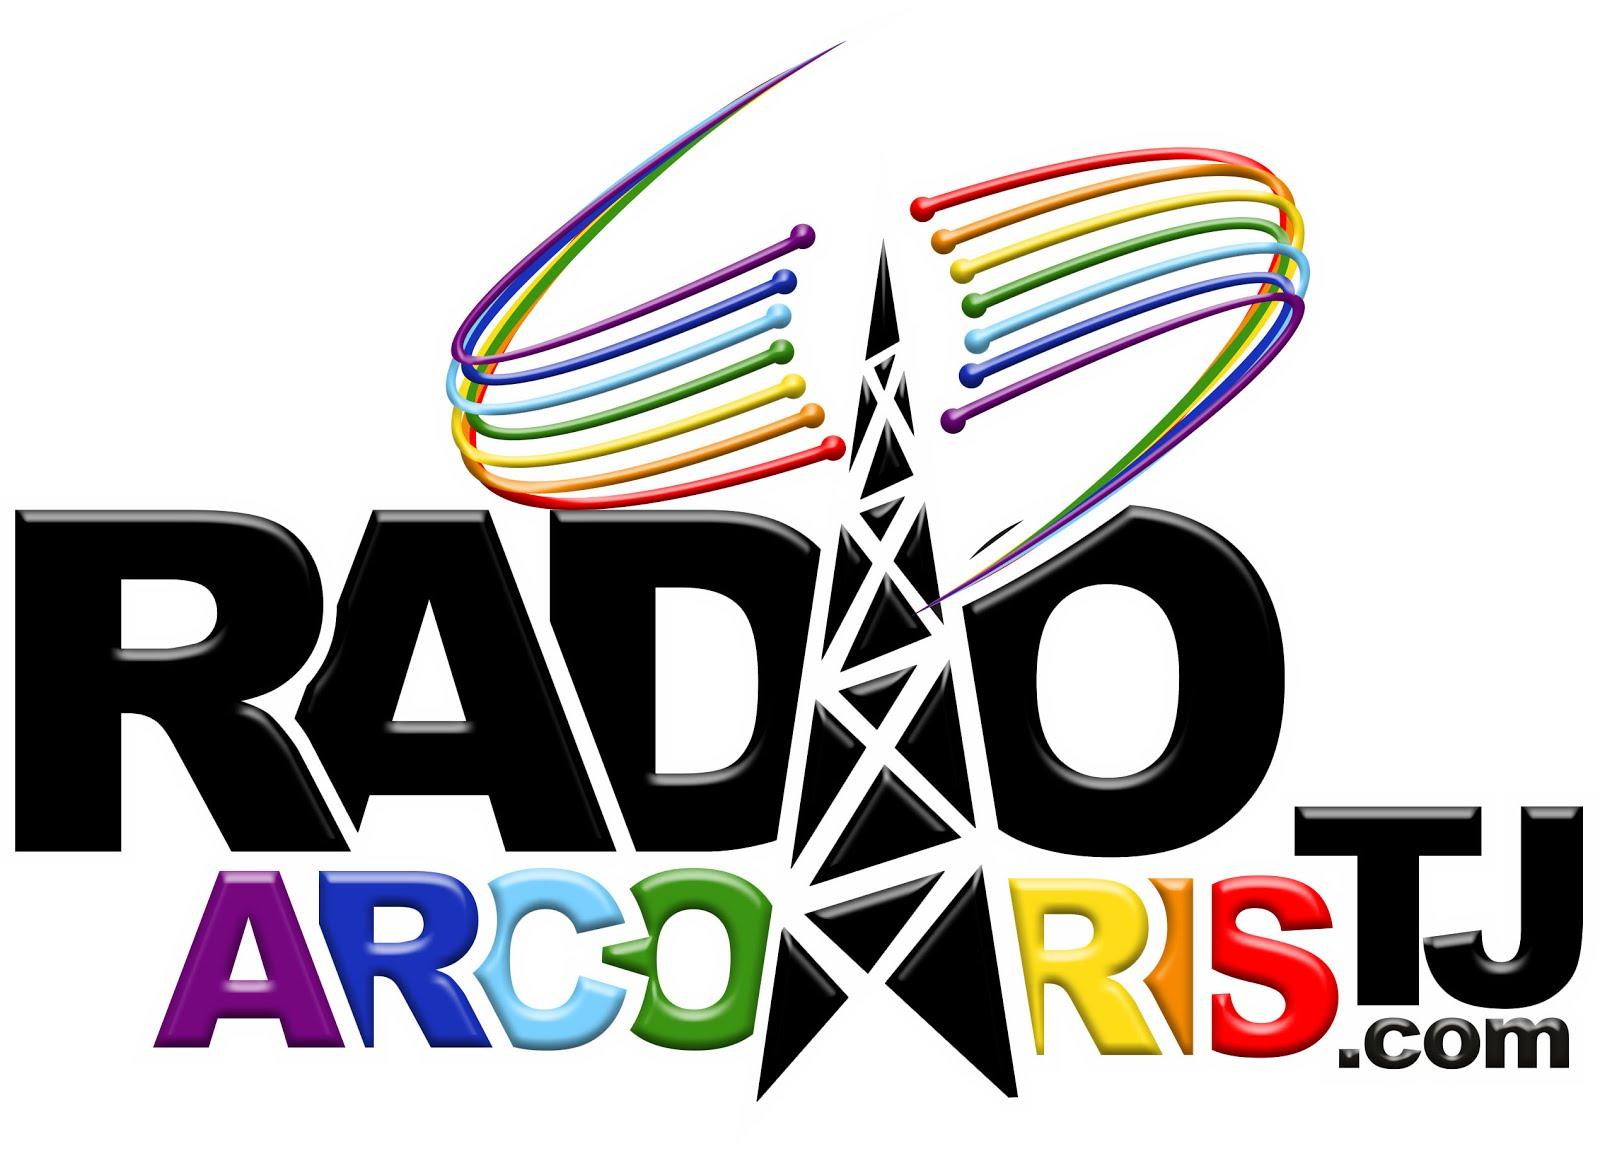 radio arco iris tj